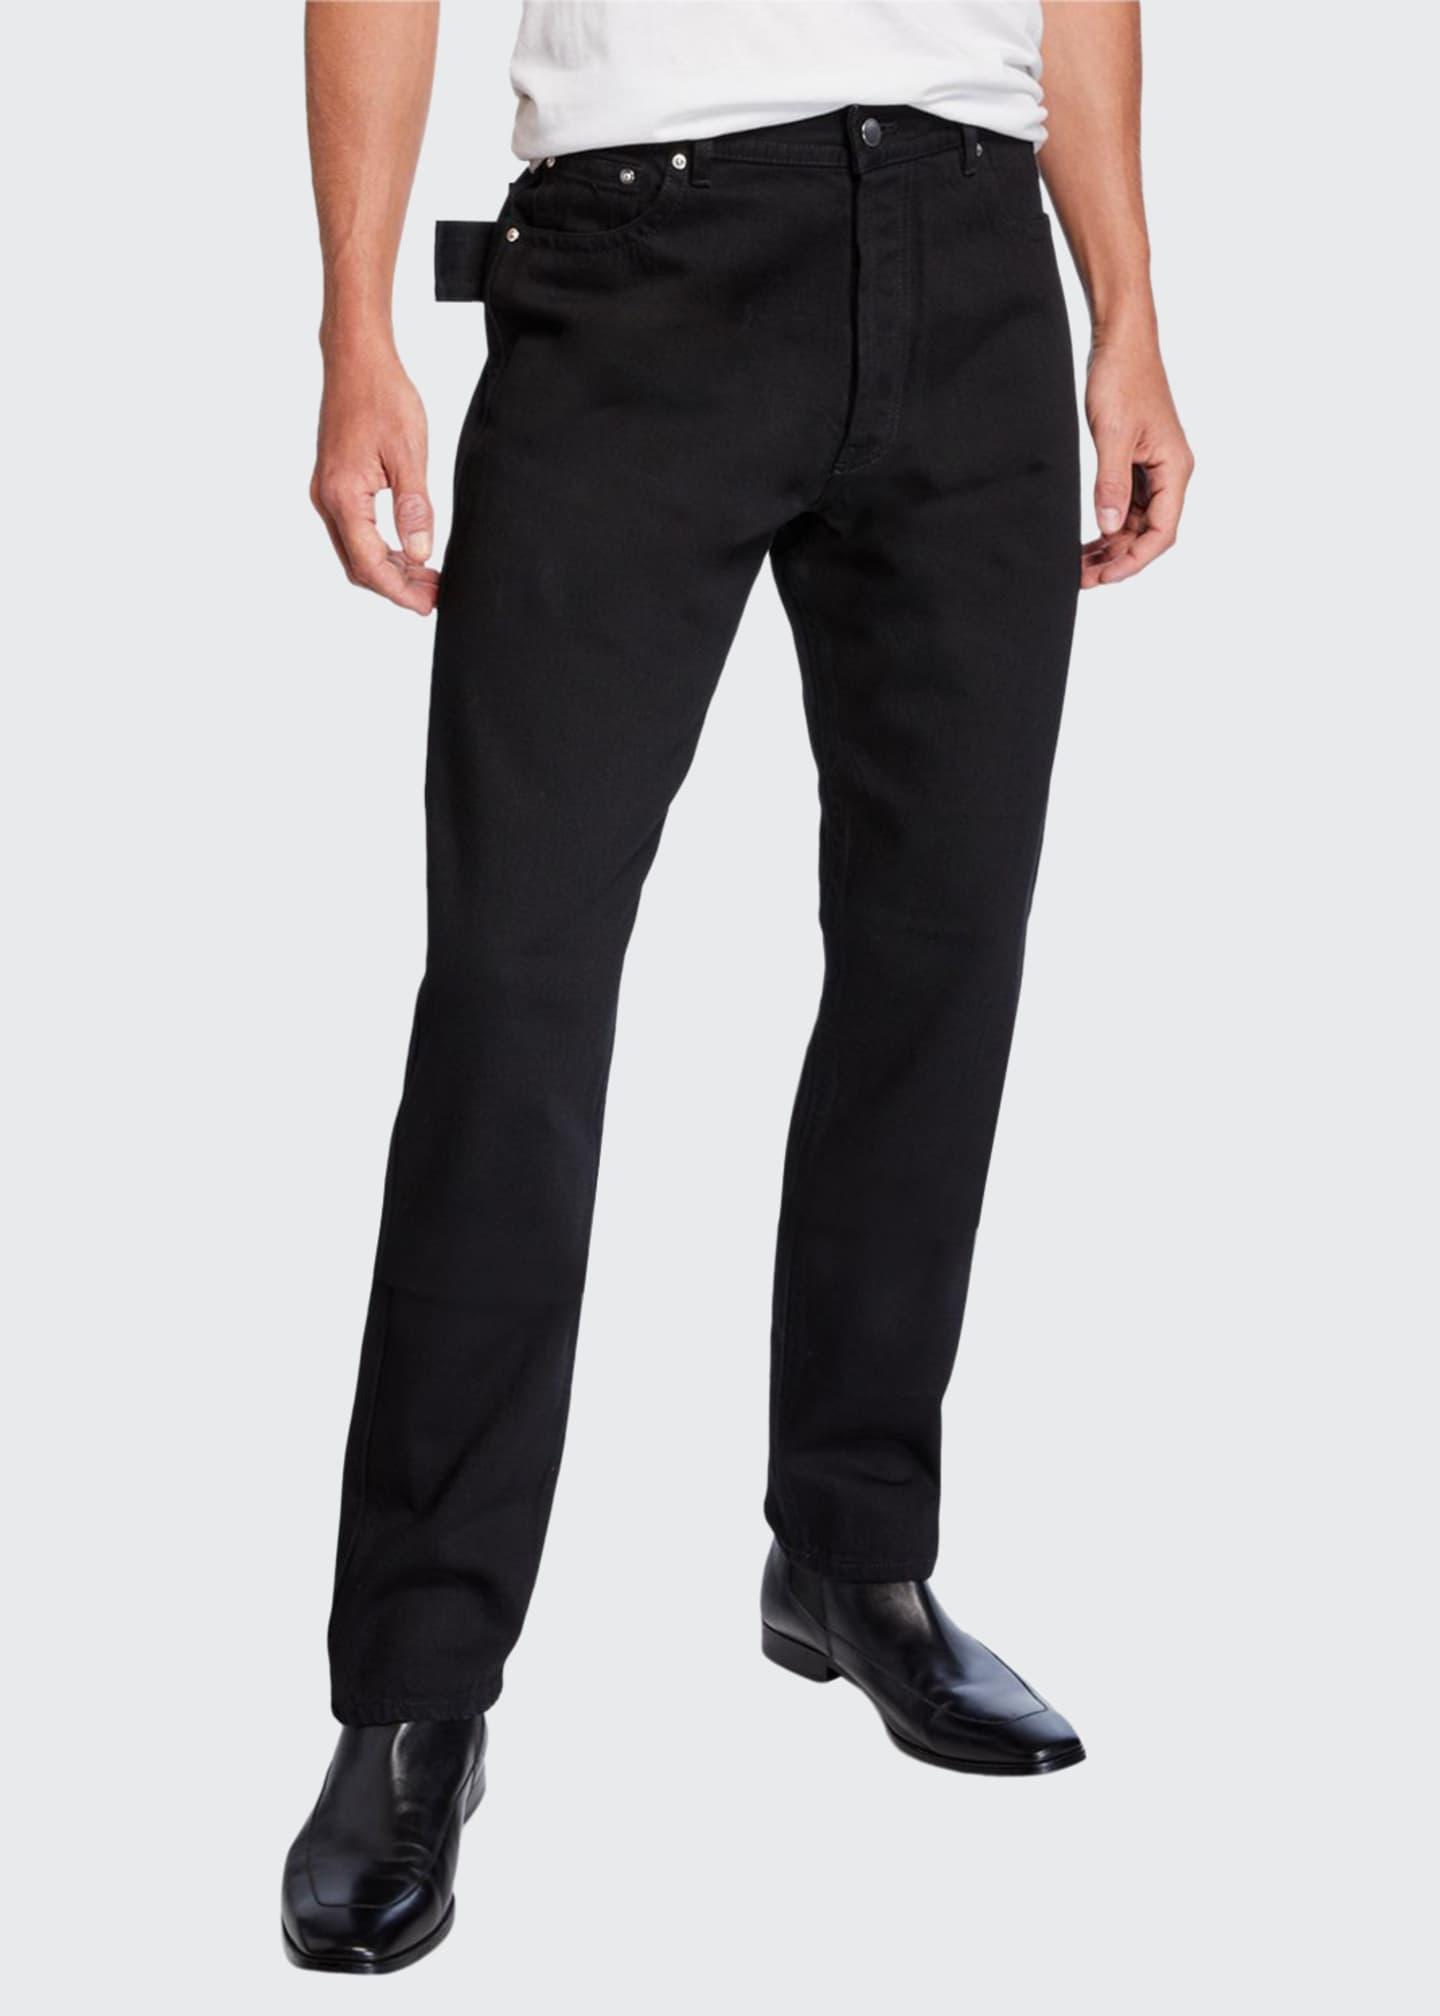 Bottega Veneta Men's Washed Denim Side-Loop Pants